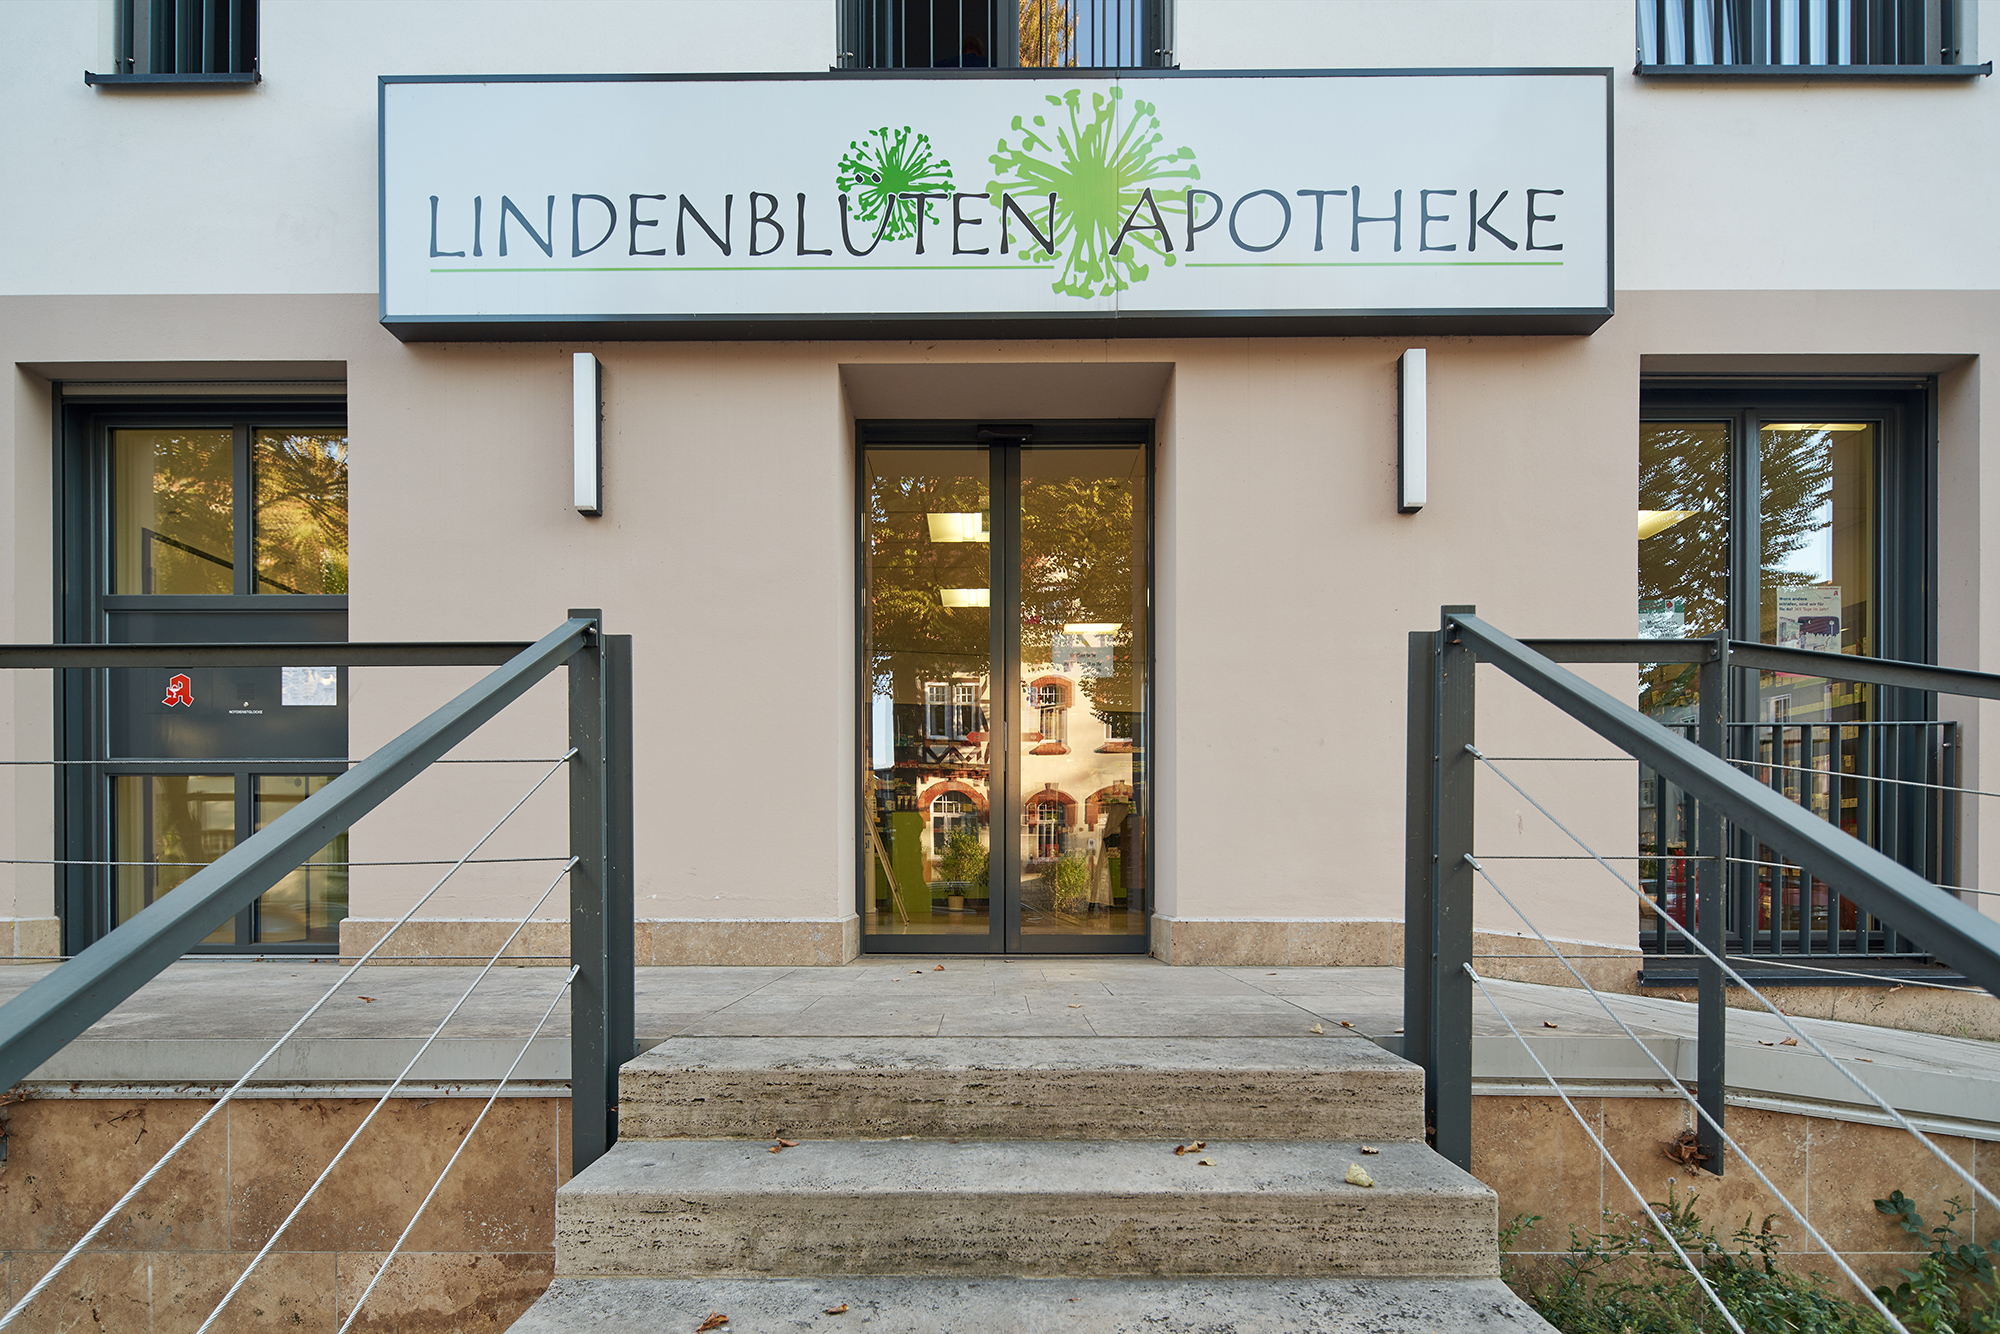 Lindenblütenapotheke Aussenansicht